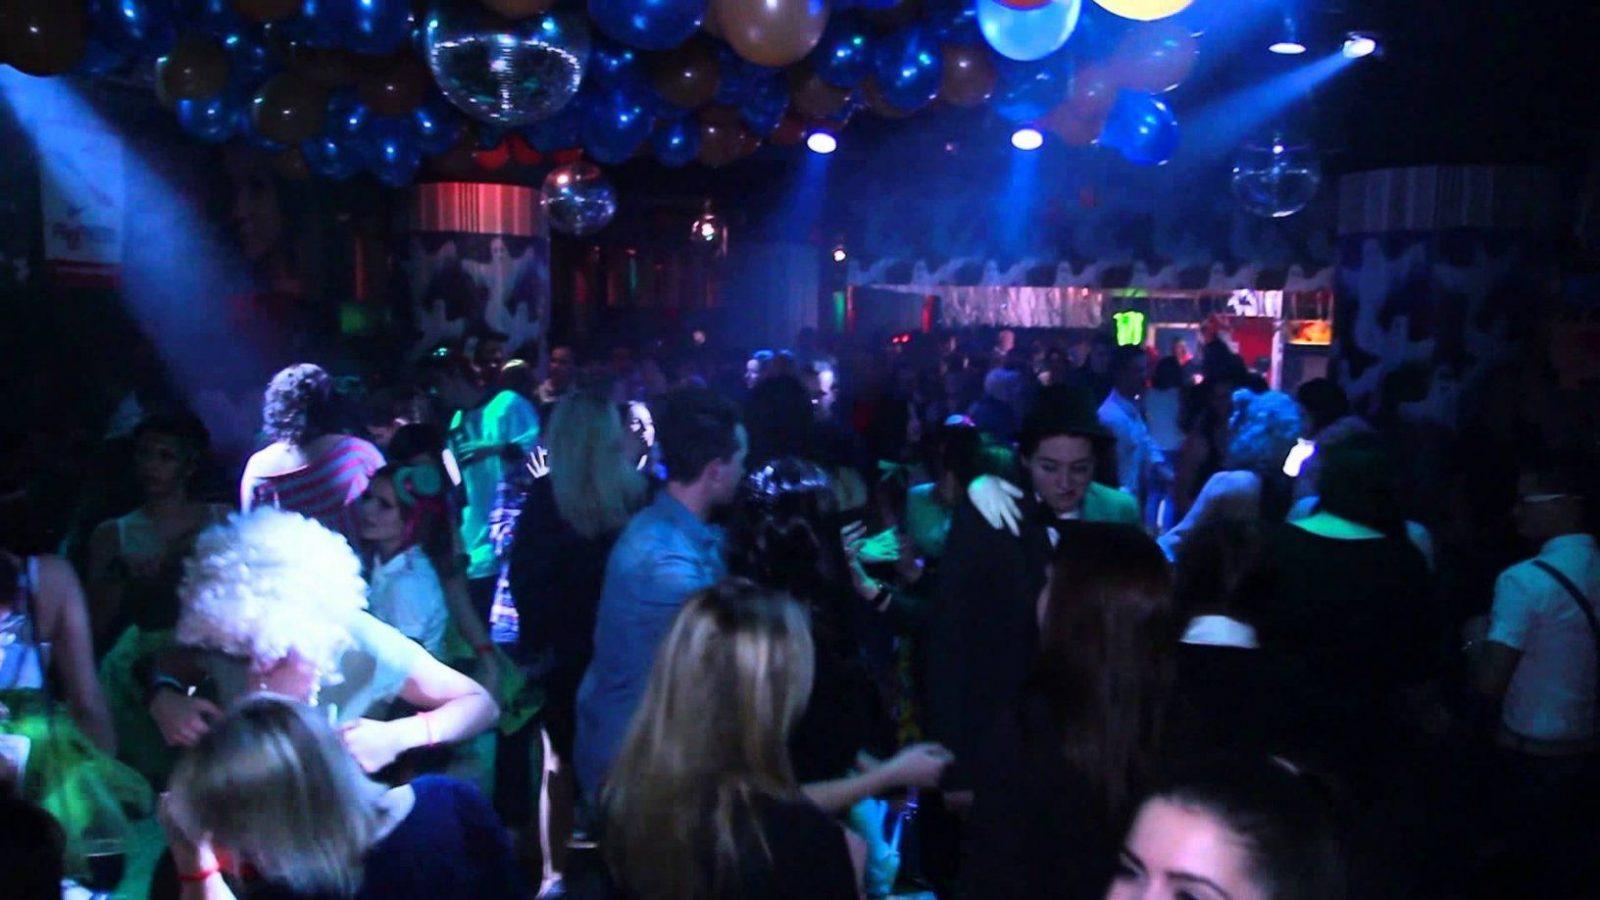 Infinity Club Partizánske  Mega Helloween Oldies Party 6  Youtube von Infinity Club Hannover Fotos Photo